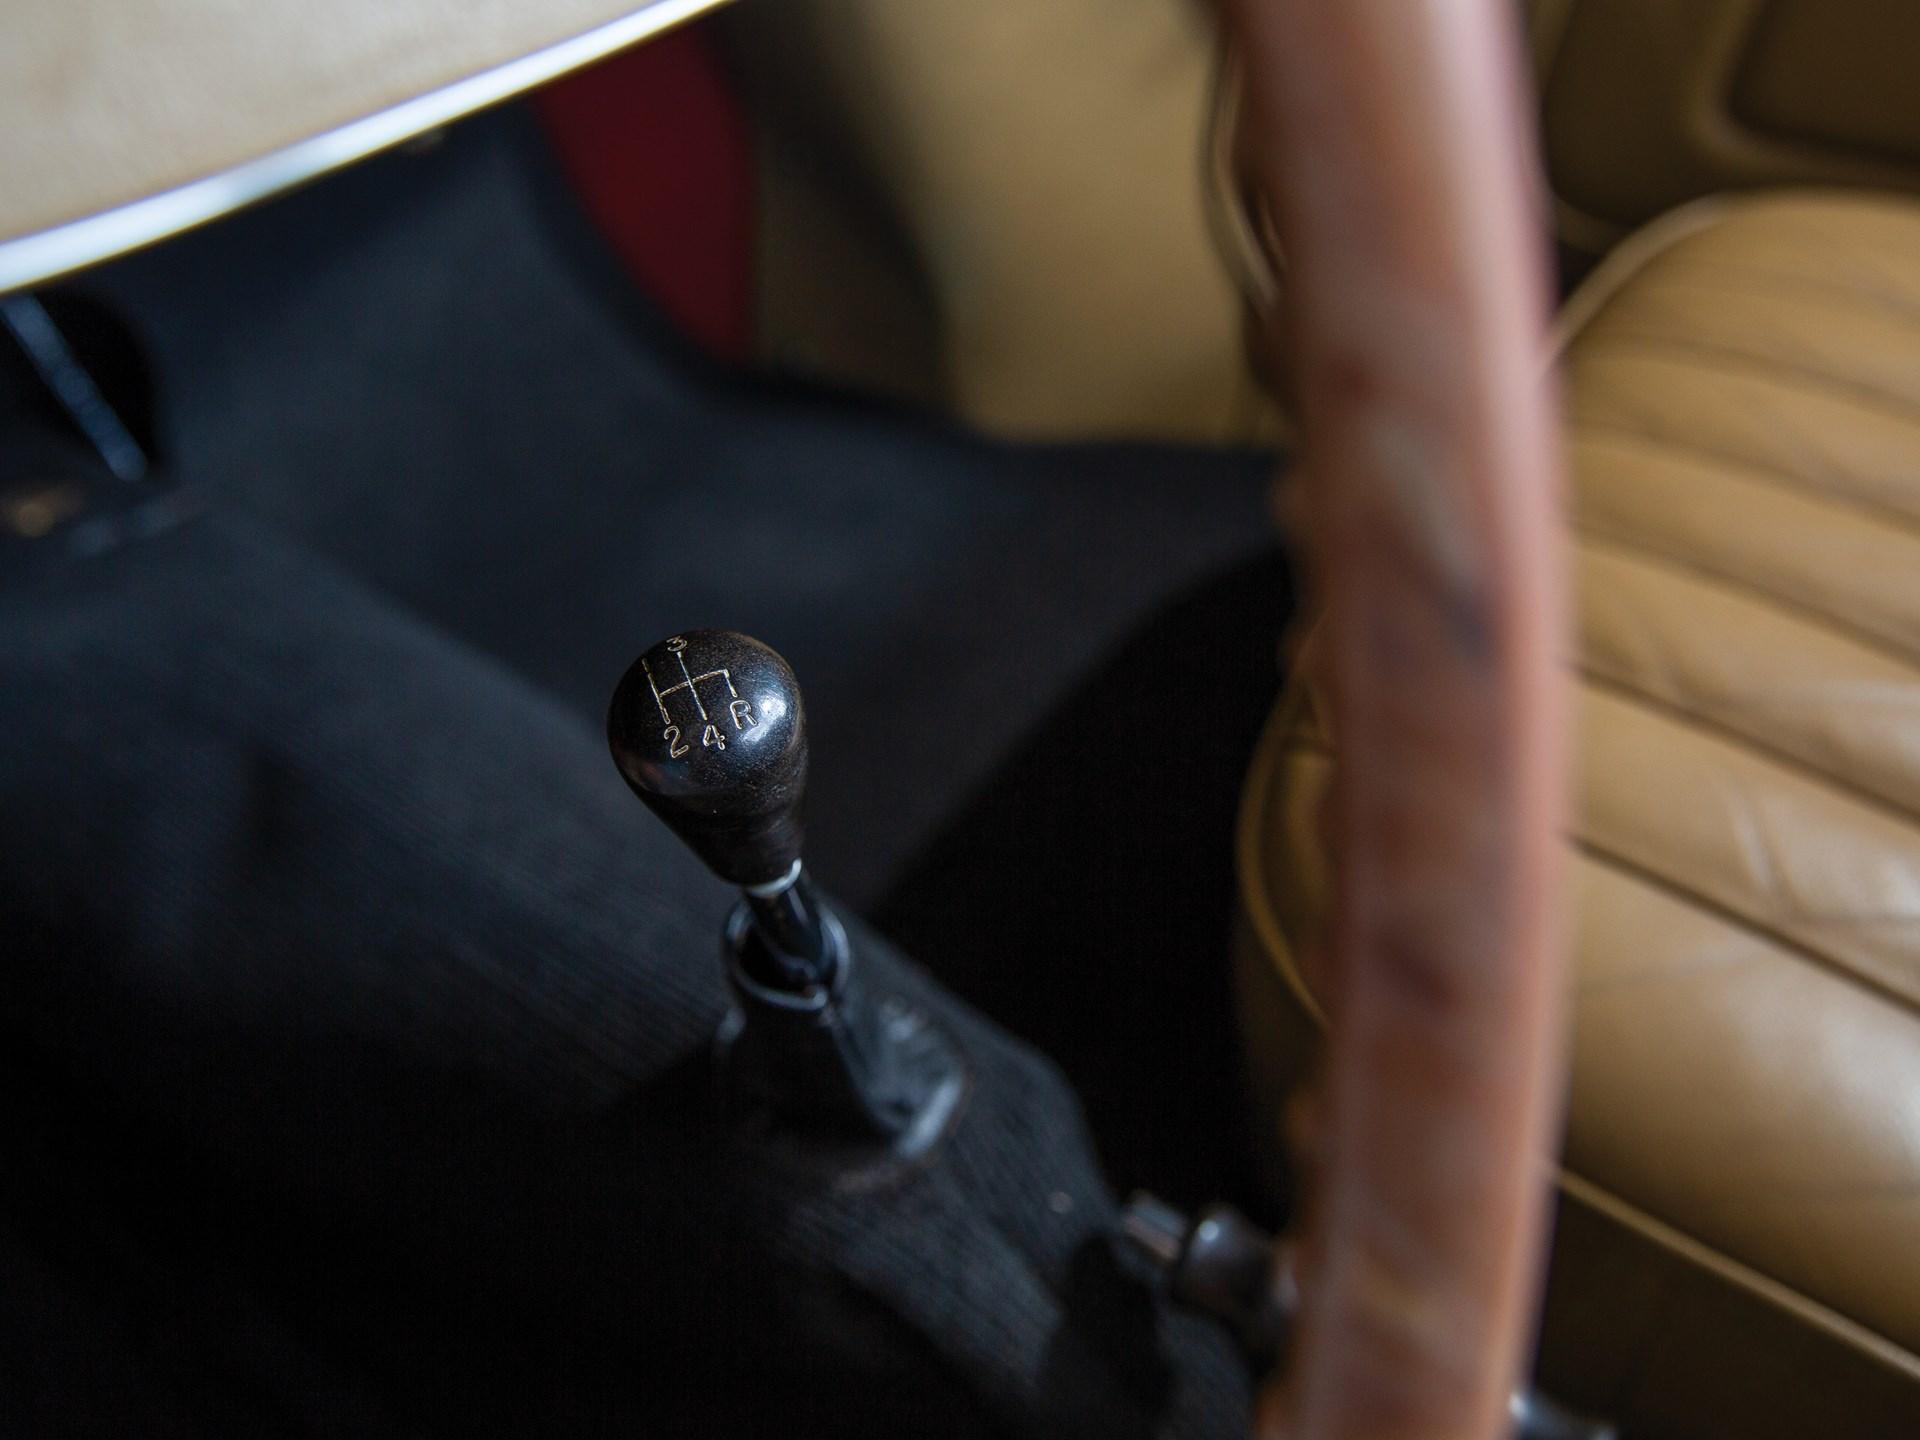 1952 MG TD shifter